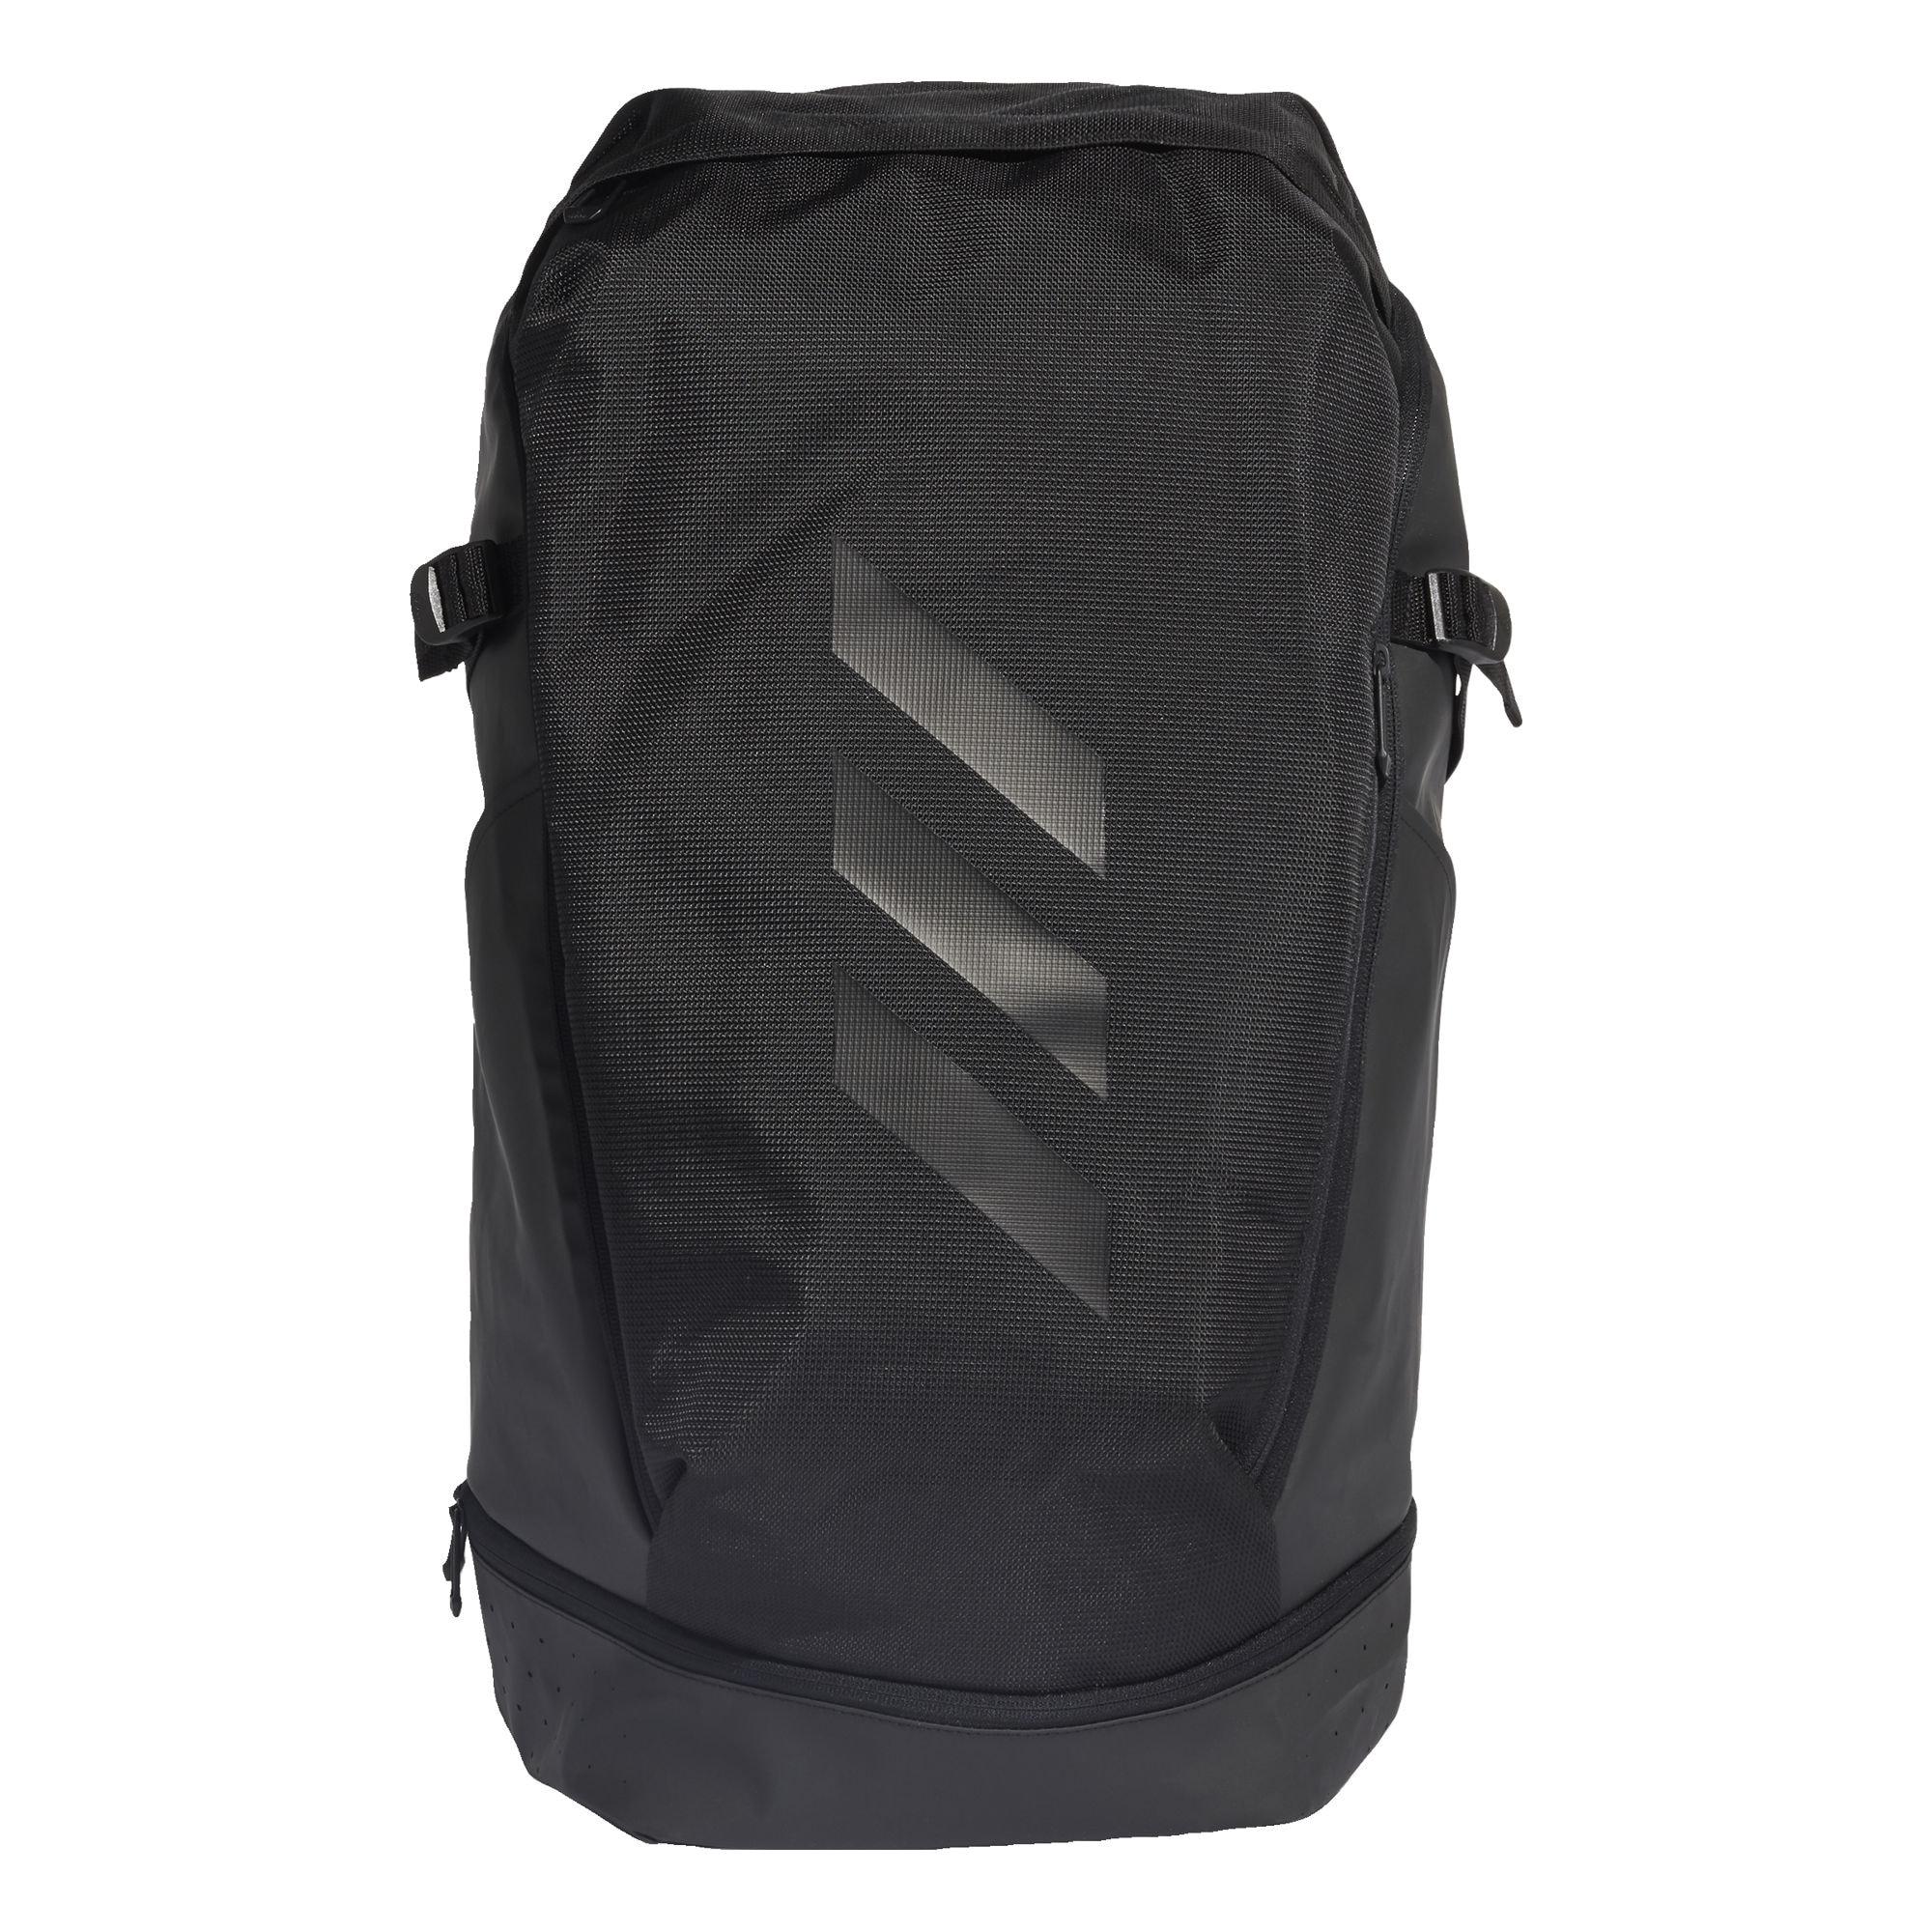 Backpack 'Creator 365' | Taschen > Rucksäcke > Tourenrucksäcke | Schwarz | ADIDAS PERFORMANCE